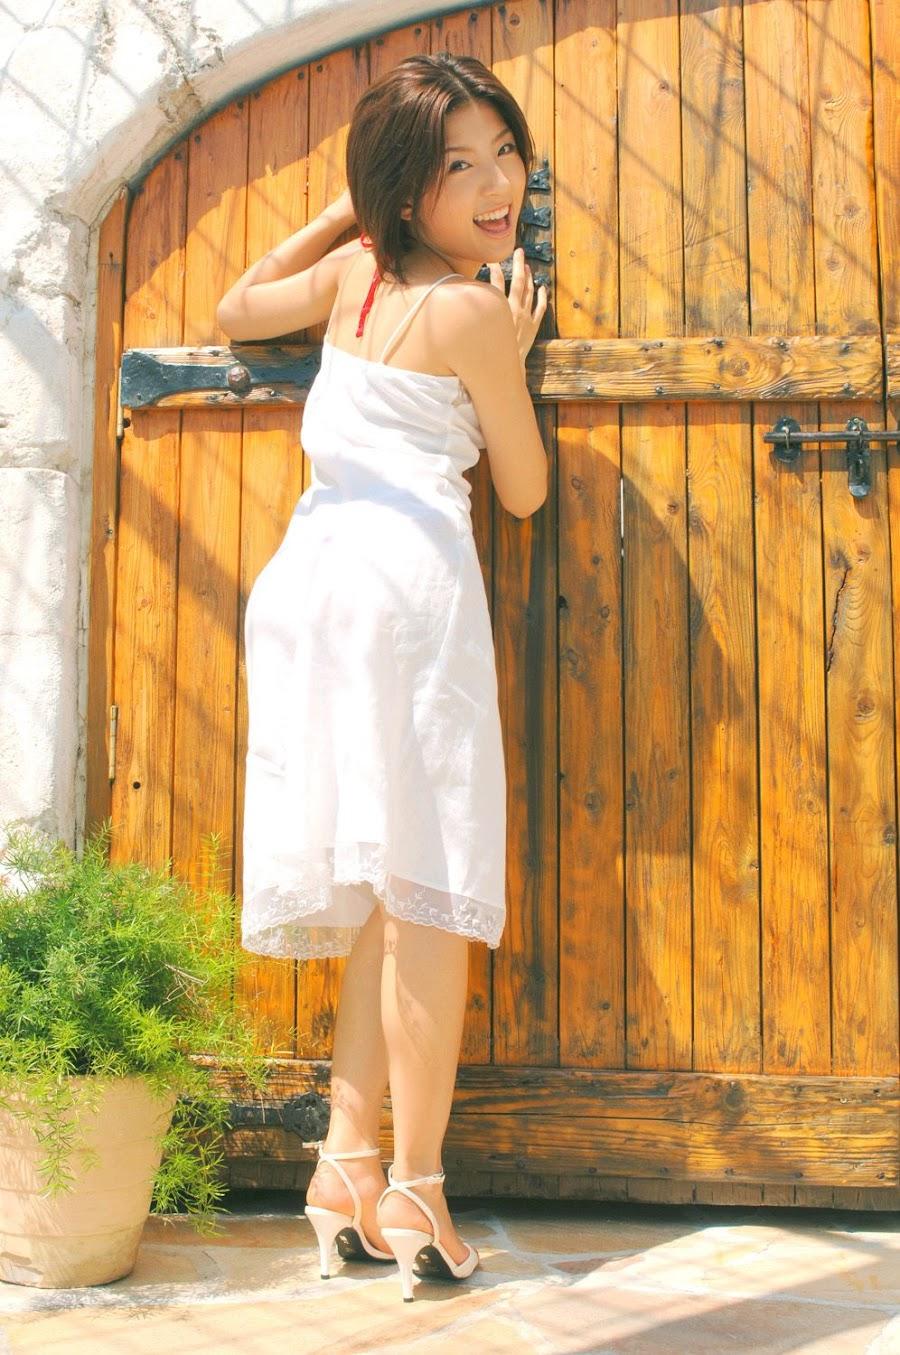 Erina Matsui - Japanese Actress & TV personality